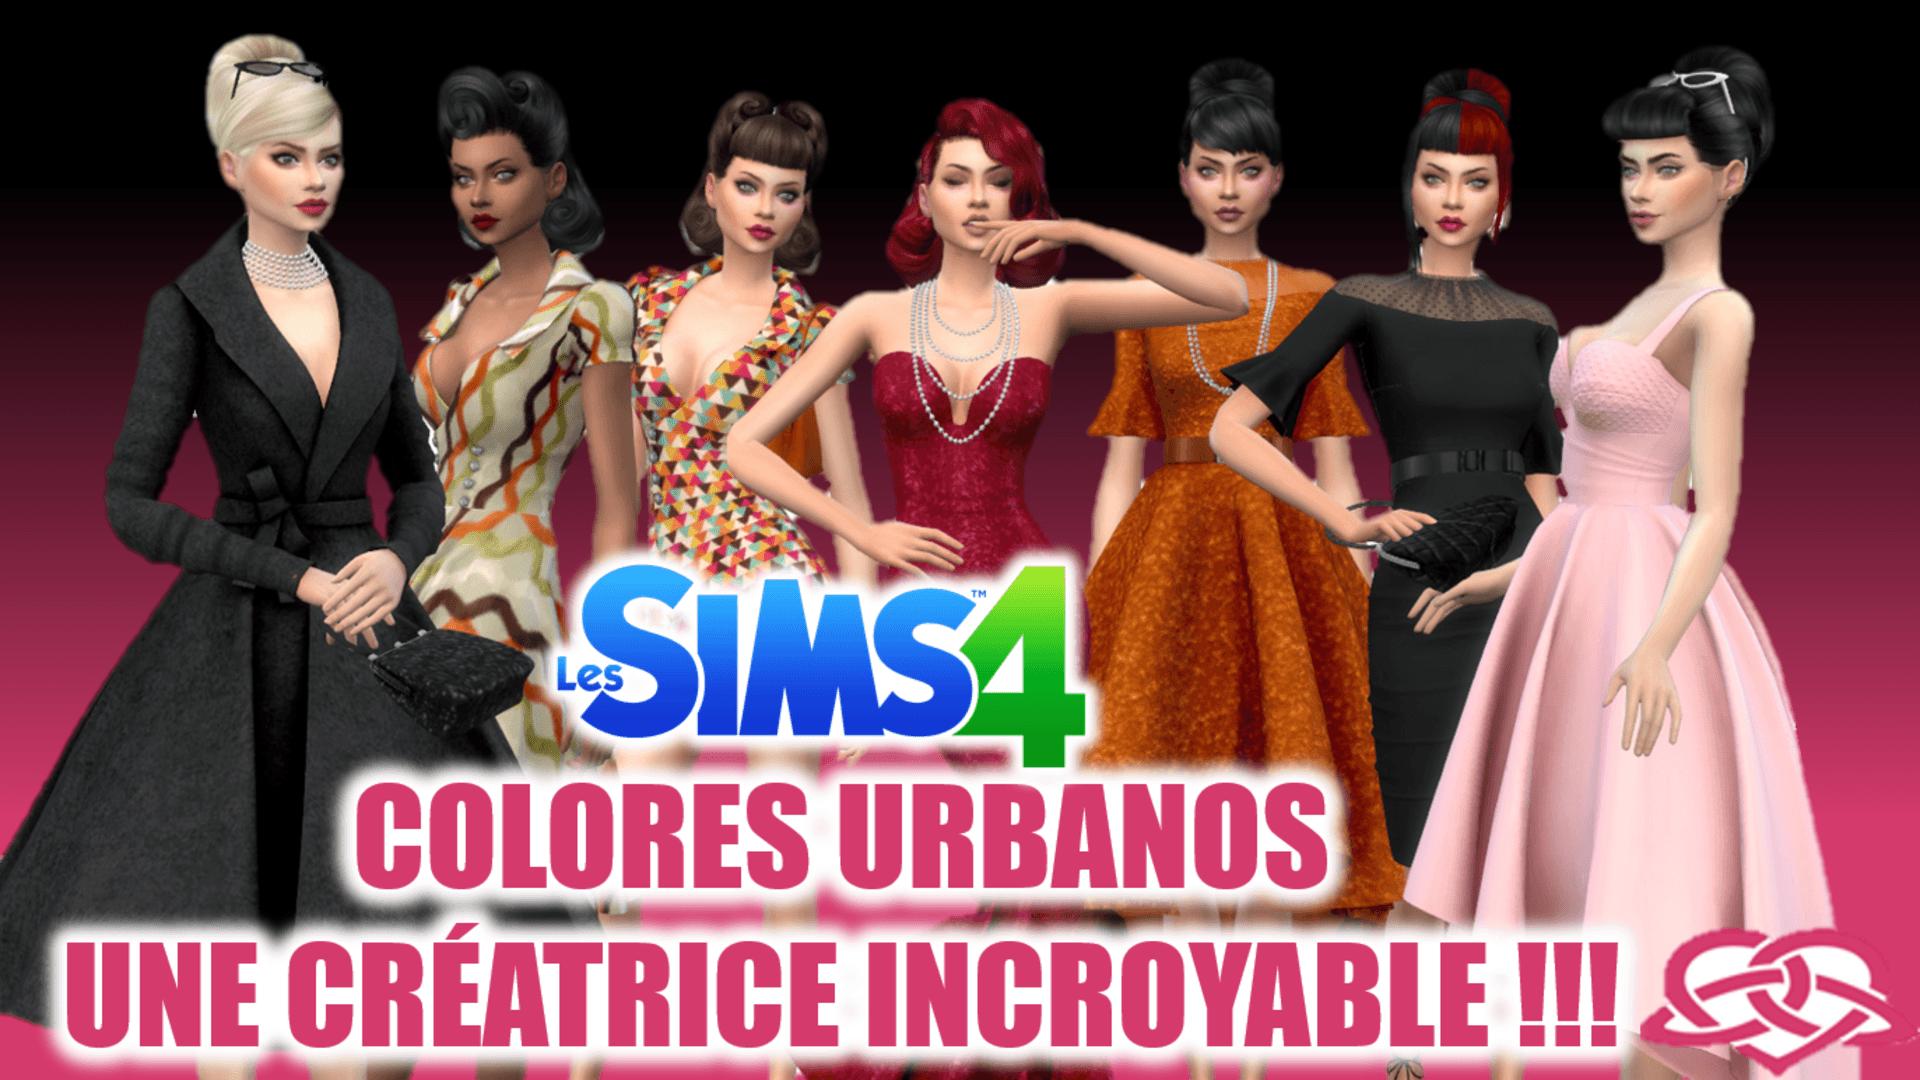 Colores Urbanos Sims 4